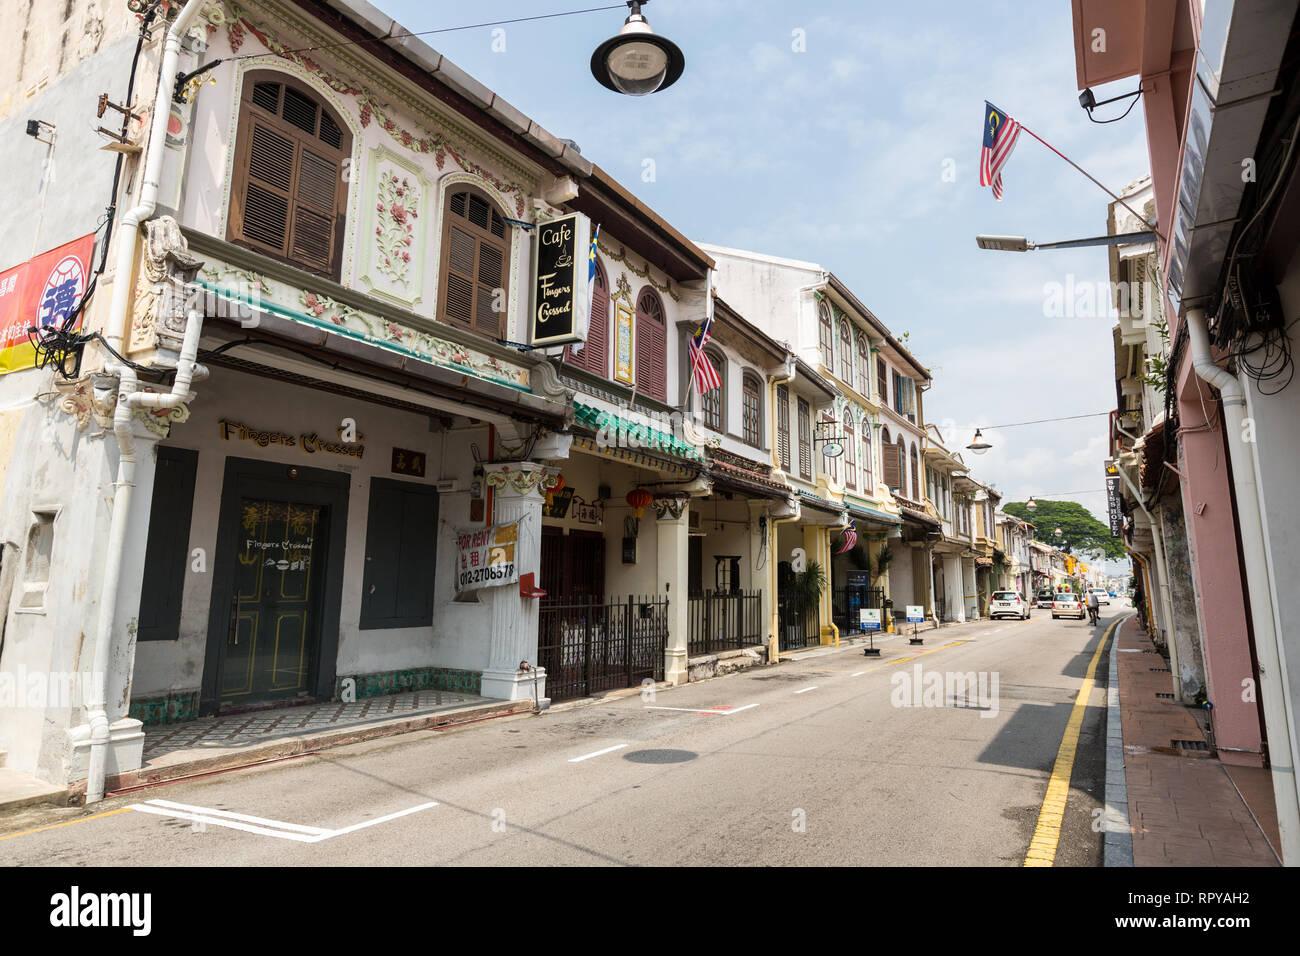 Early Twentieth-century Chinese Shophouse, Heeren Street, Jalan Tun Tan Cheng Lock, Melaka, Malaysia. - Stock Image